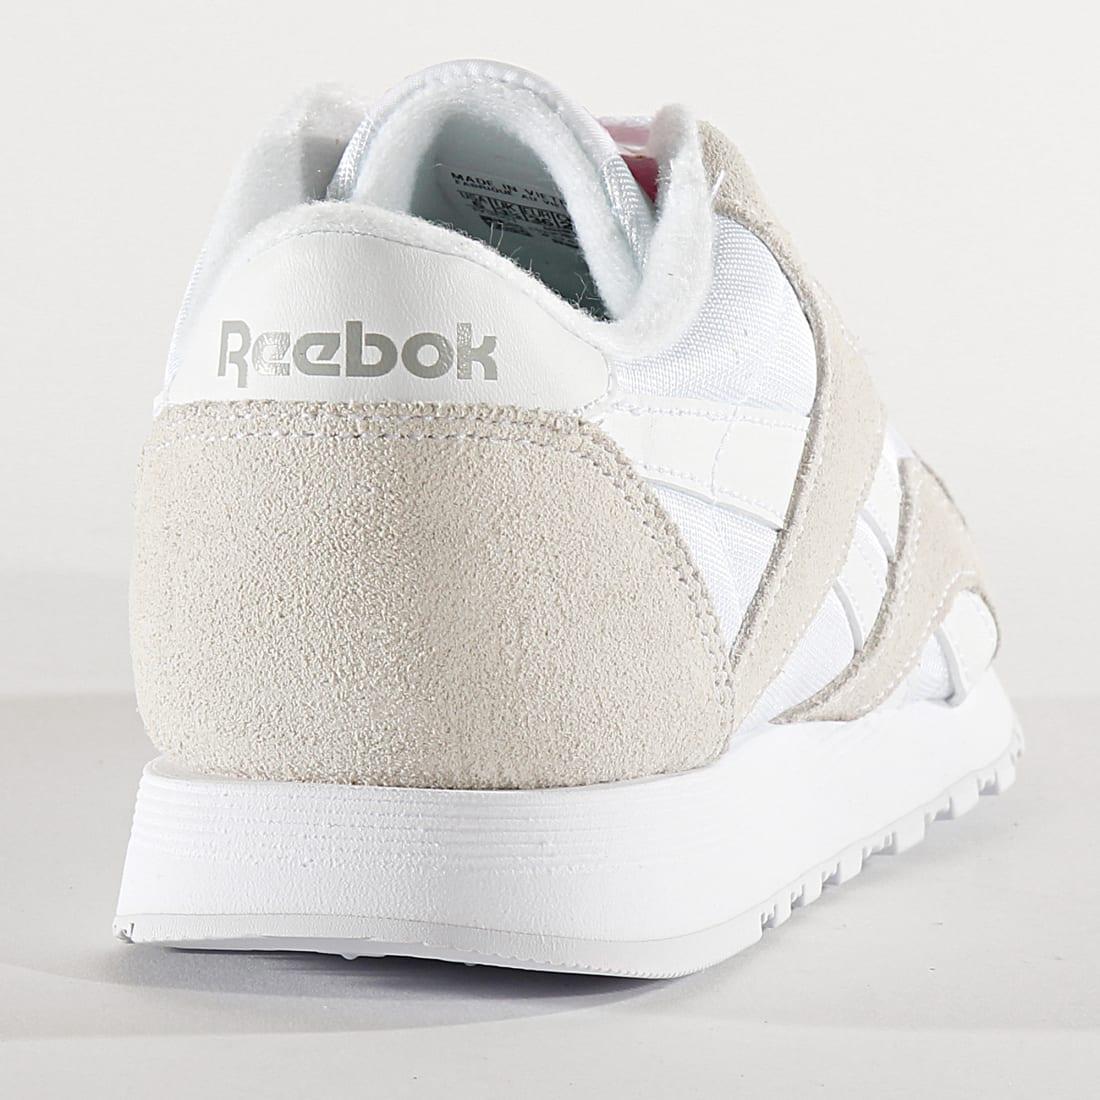 Reebok Baskets Femme Classic Leather Nylon FV4507 White